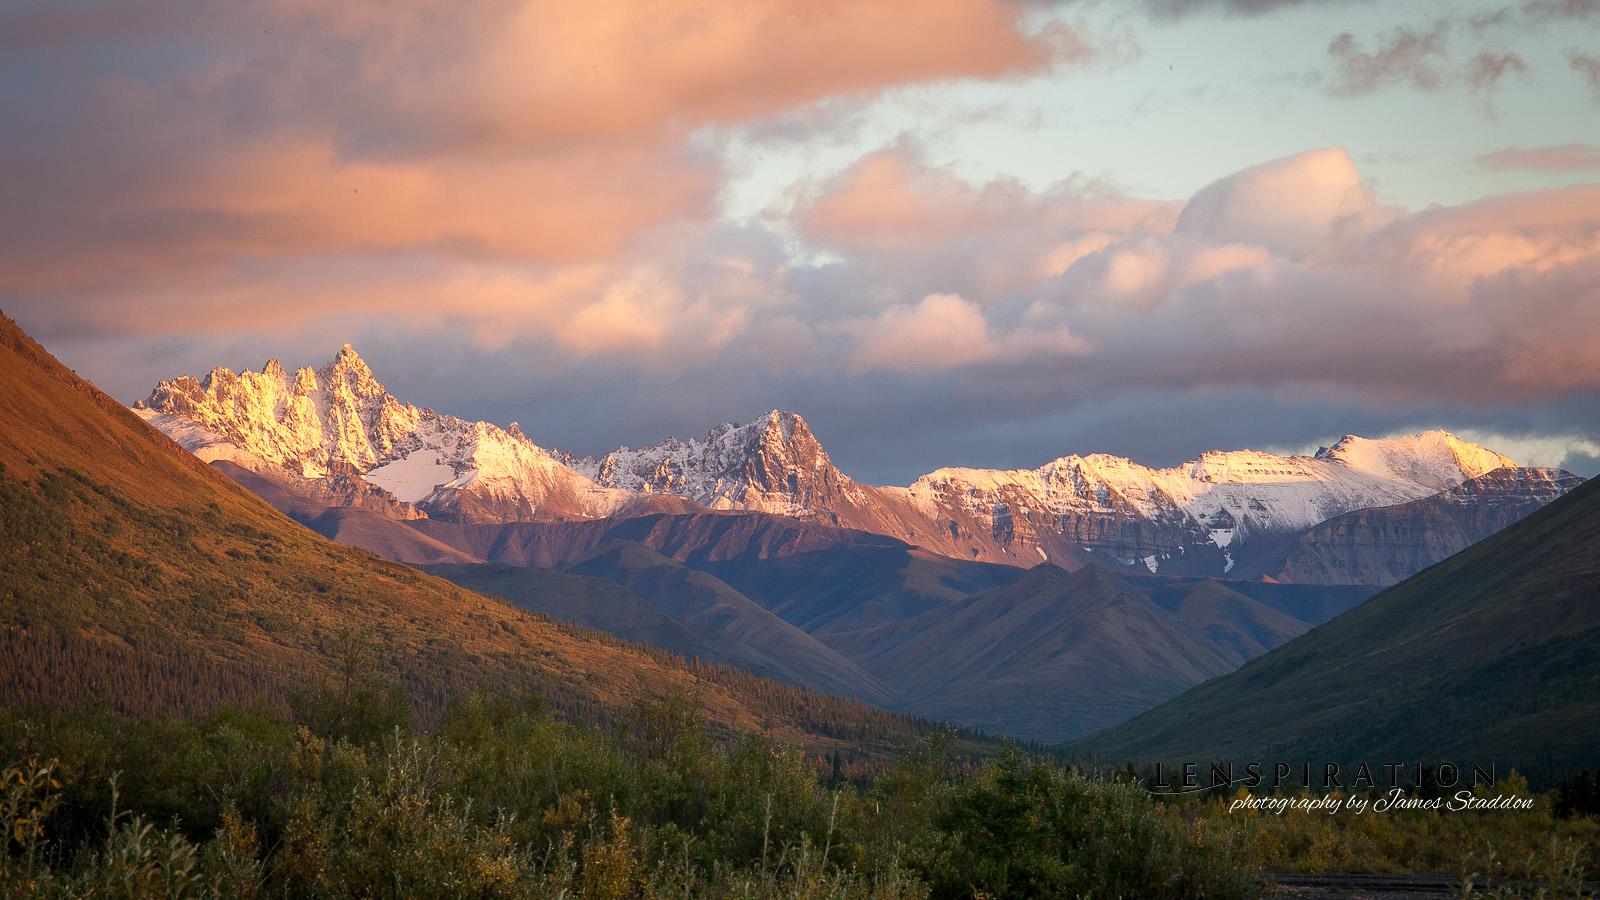 denali national park healy alaska 1280 x 1024px 5 4 1440 x 900px 8 5 1600x900